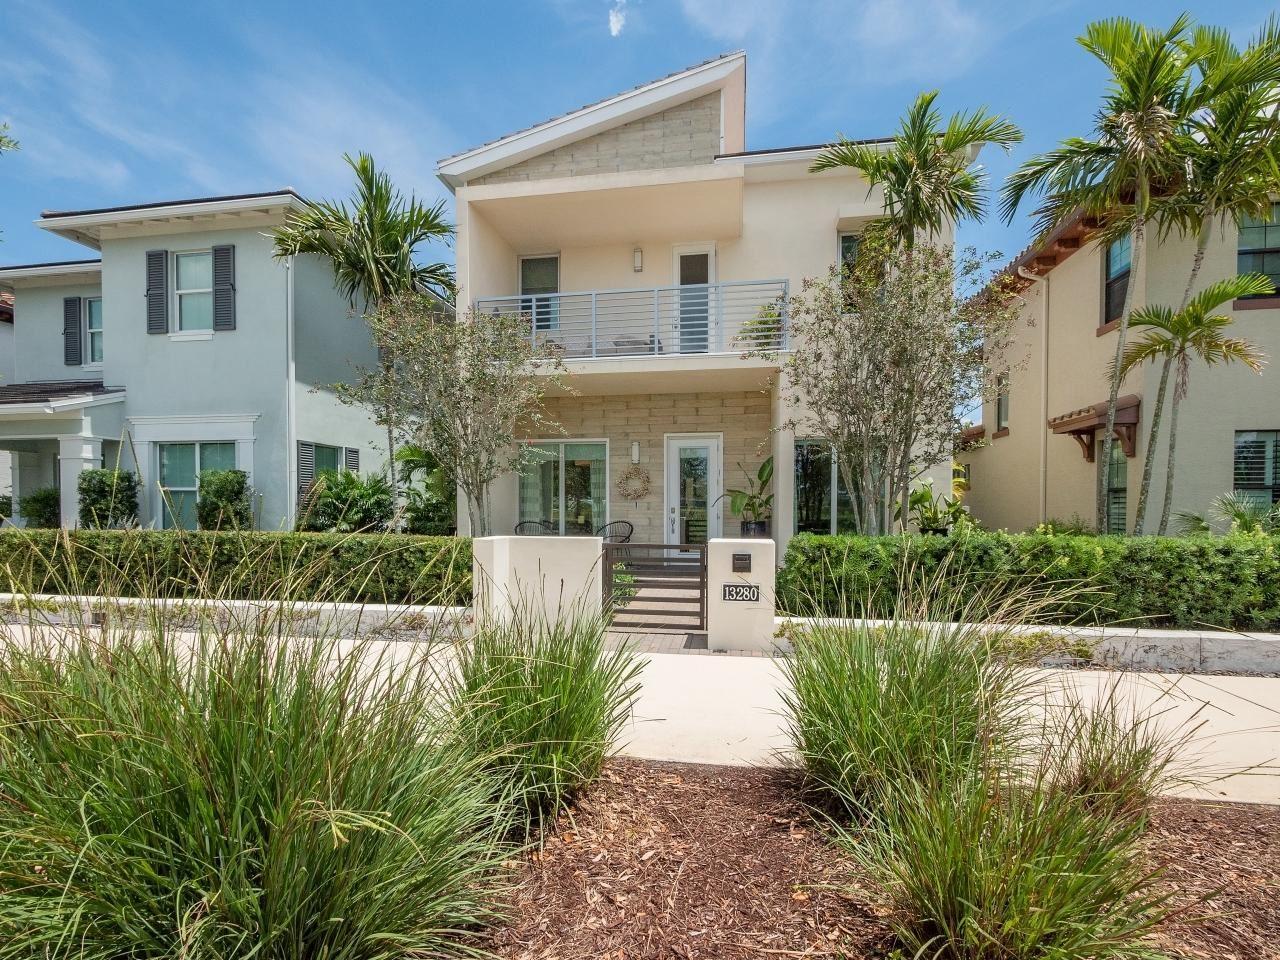 13280 Alton Road, Palm Beach Gardens, FL 33418 - MLS#: RX-10710181